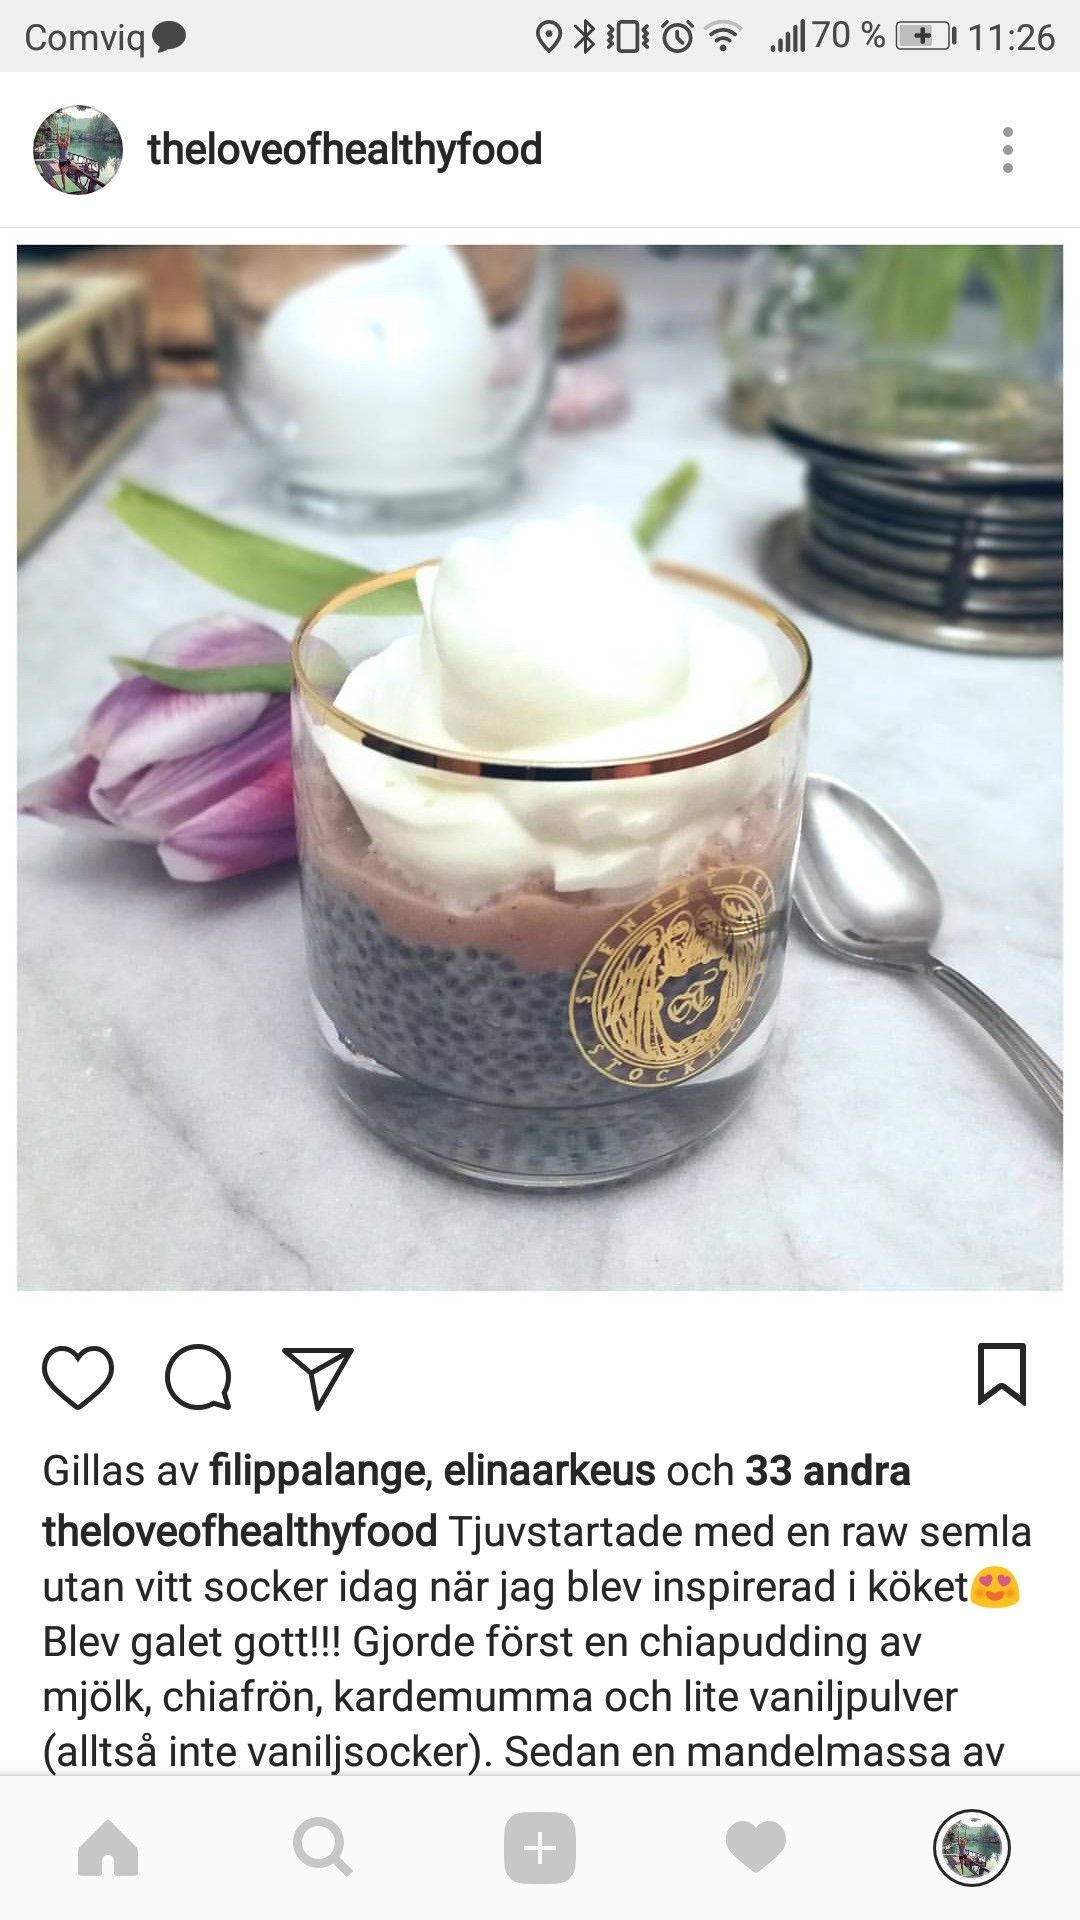 chiapudding med mjölk